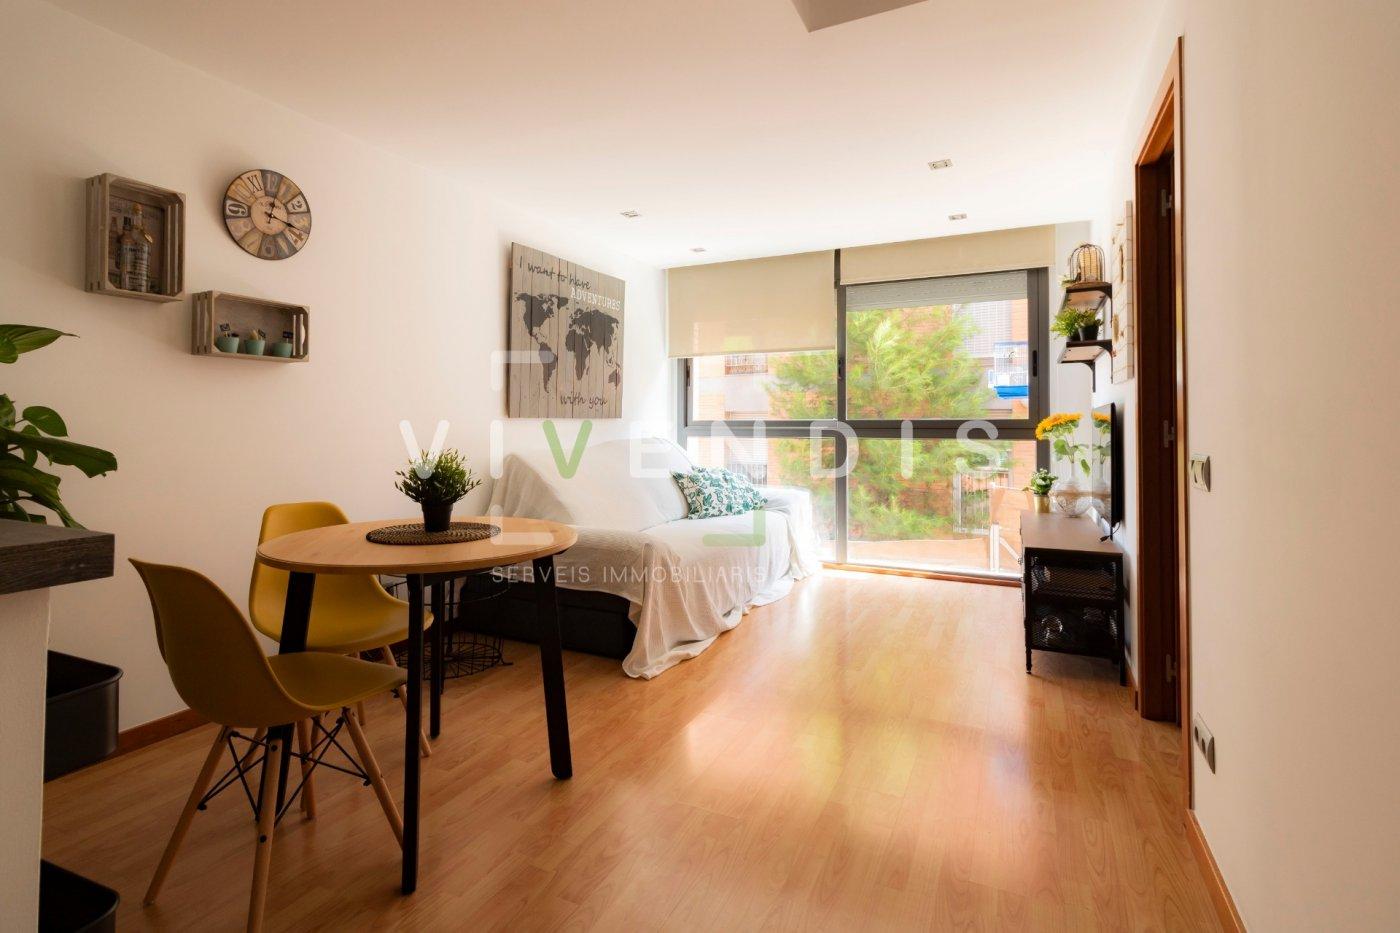 piso en sant-andreu-de-la-barca · residencial 197000€